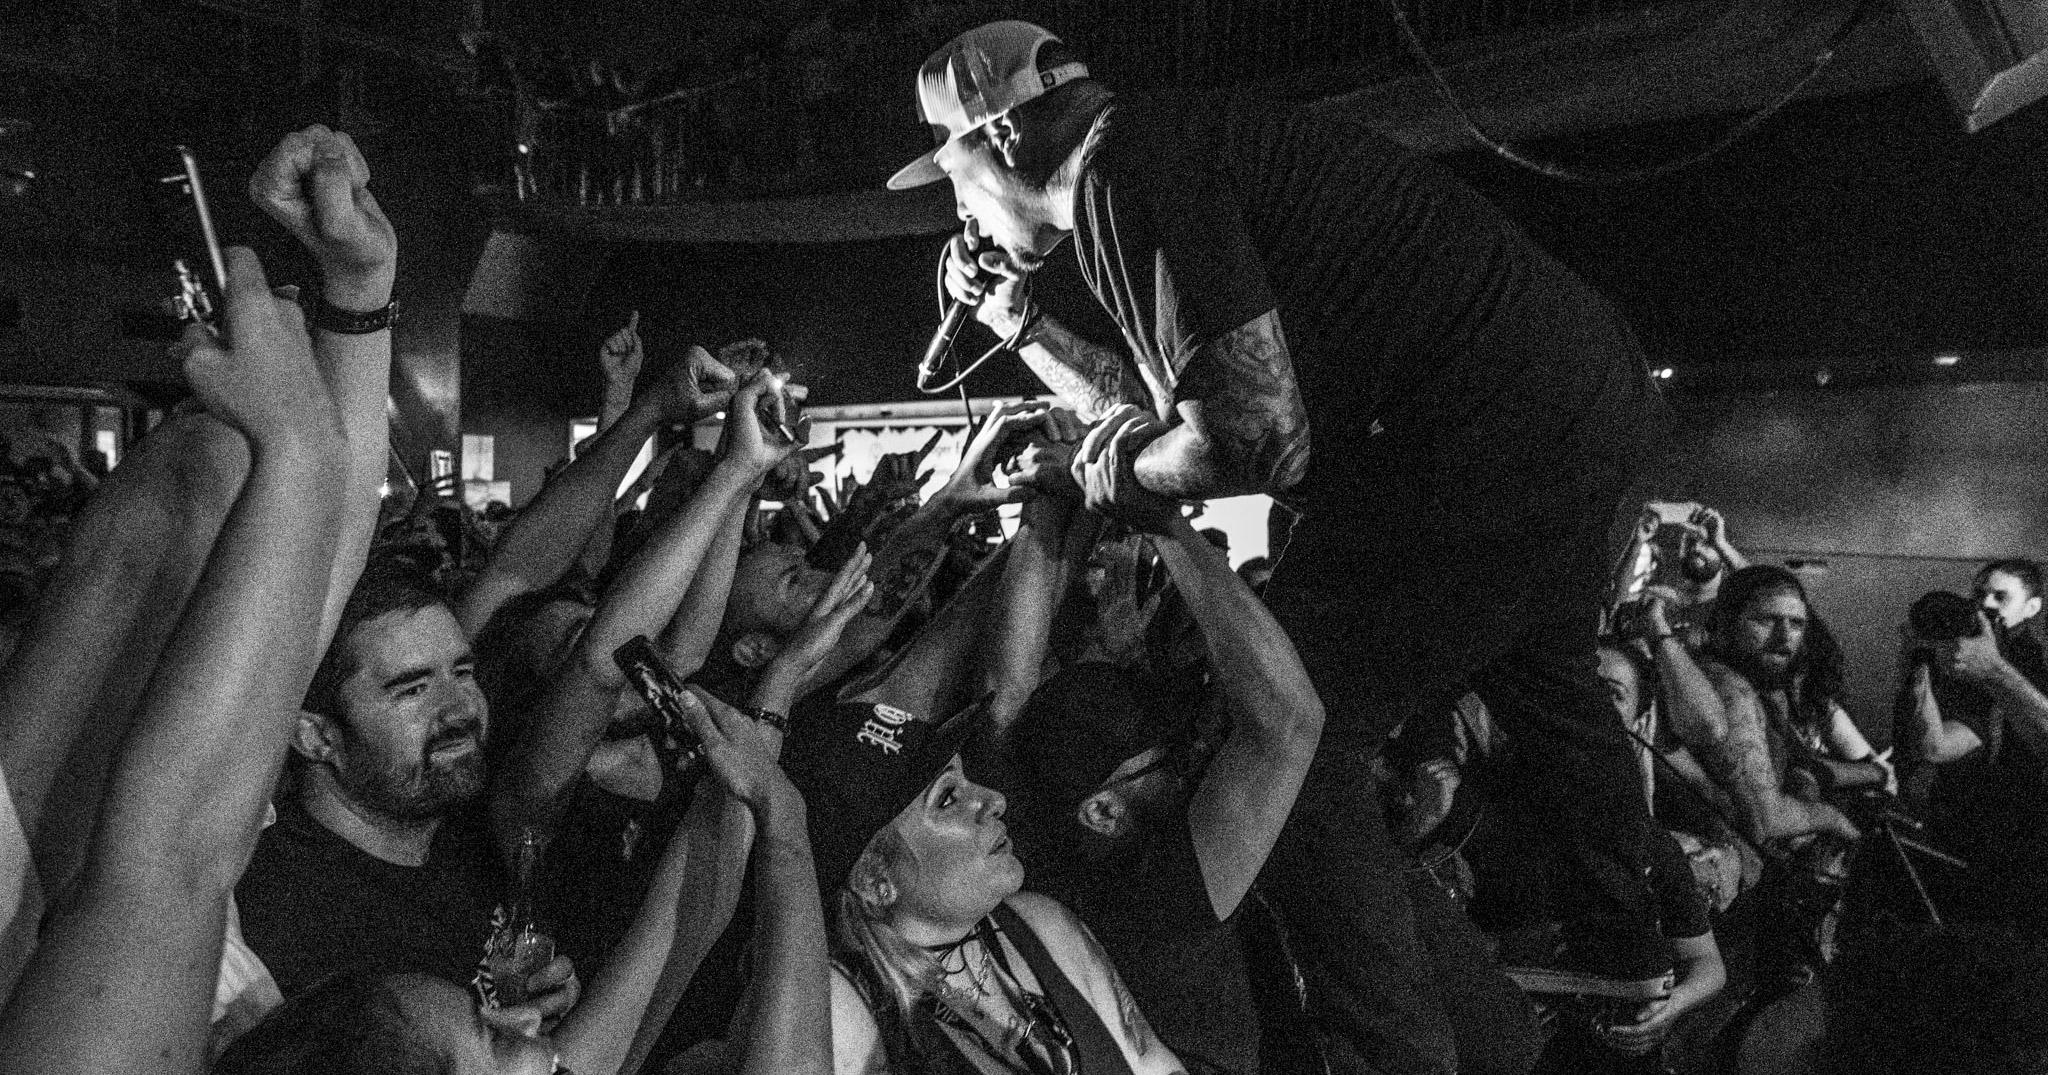 Concert Review - P O D , Auckland New Zealand, 2018